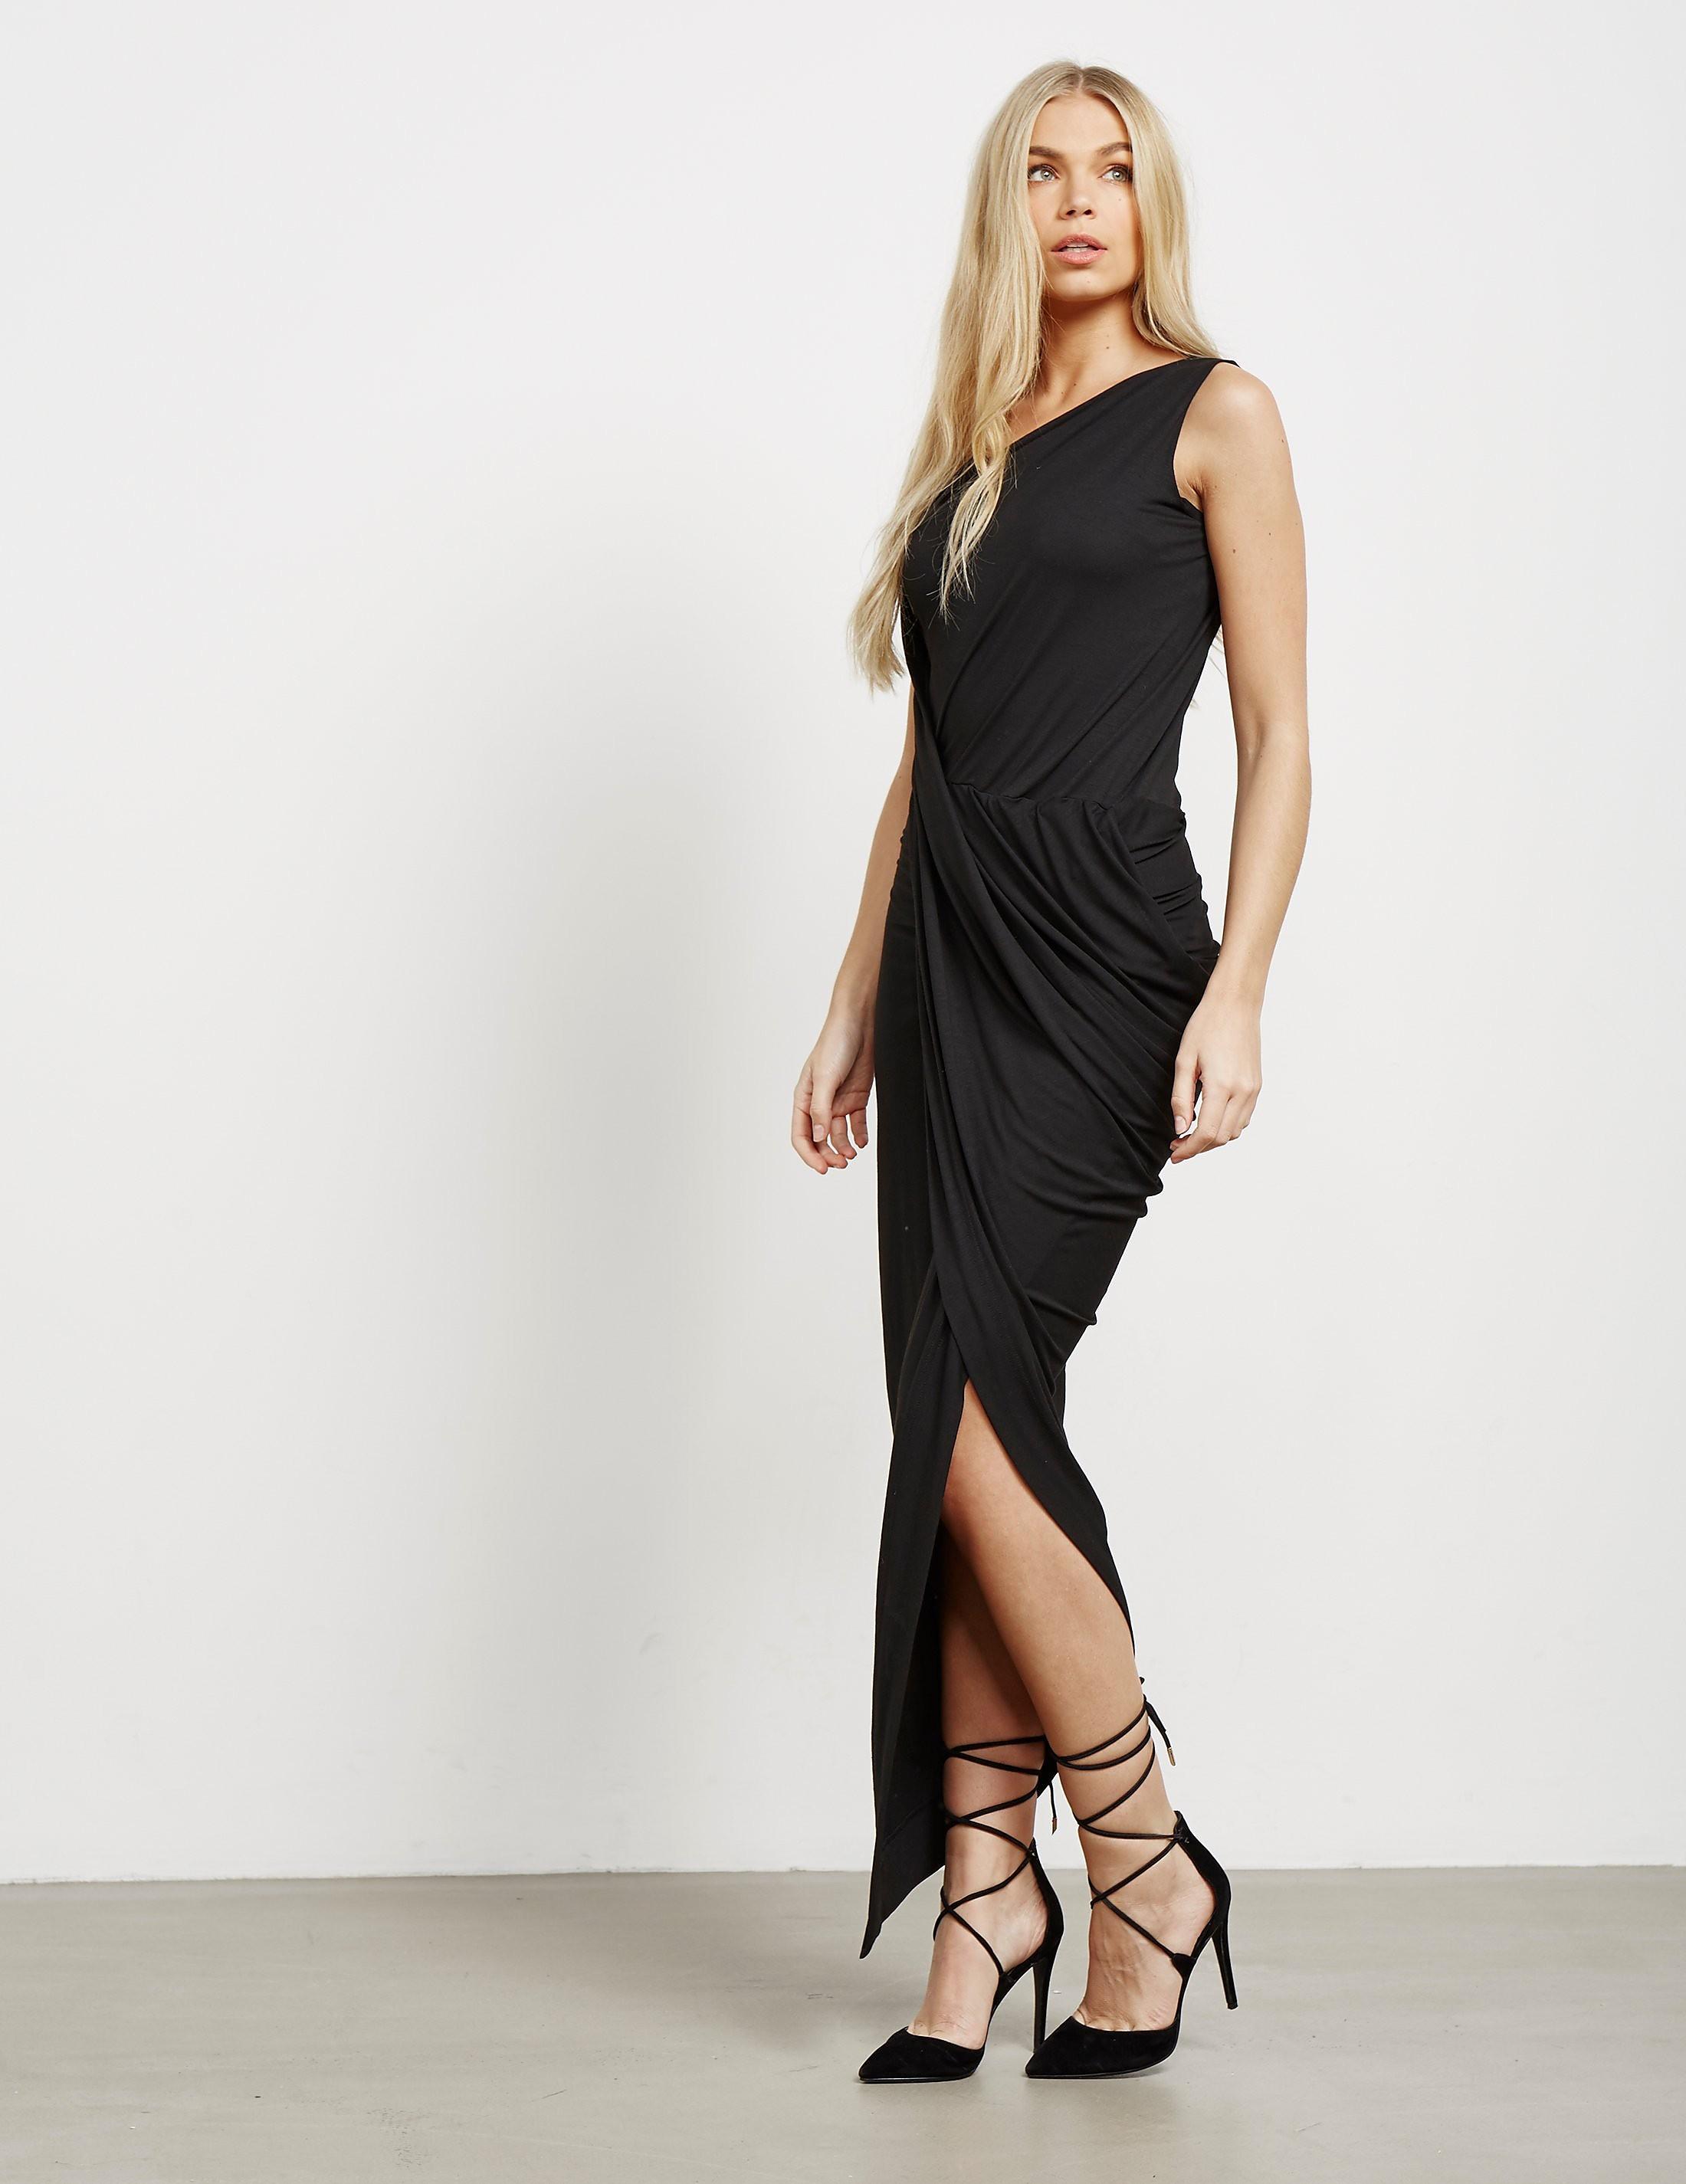 Vivienne Westwood Anglomania Vian Dress